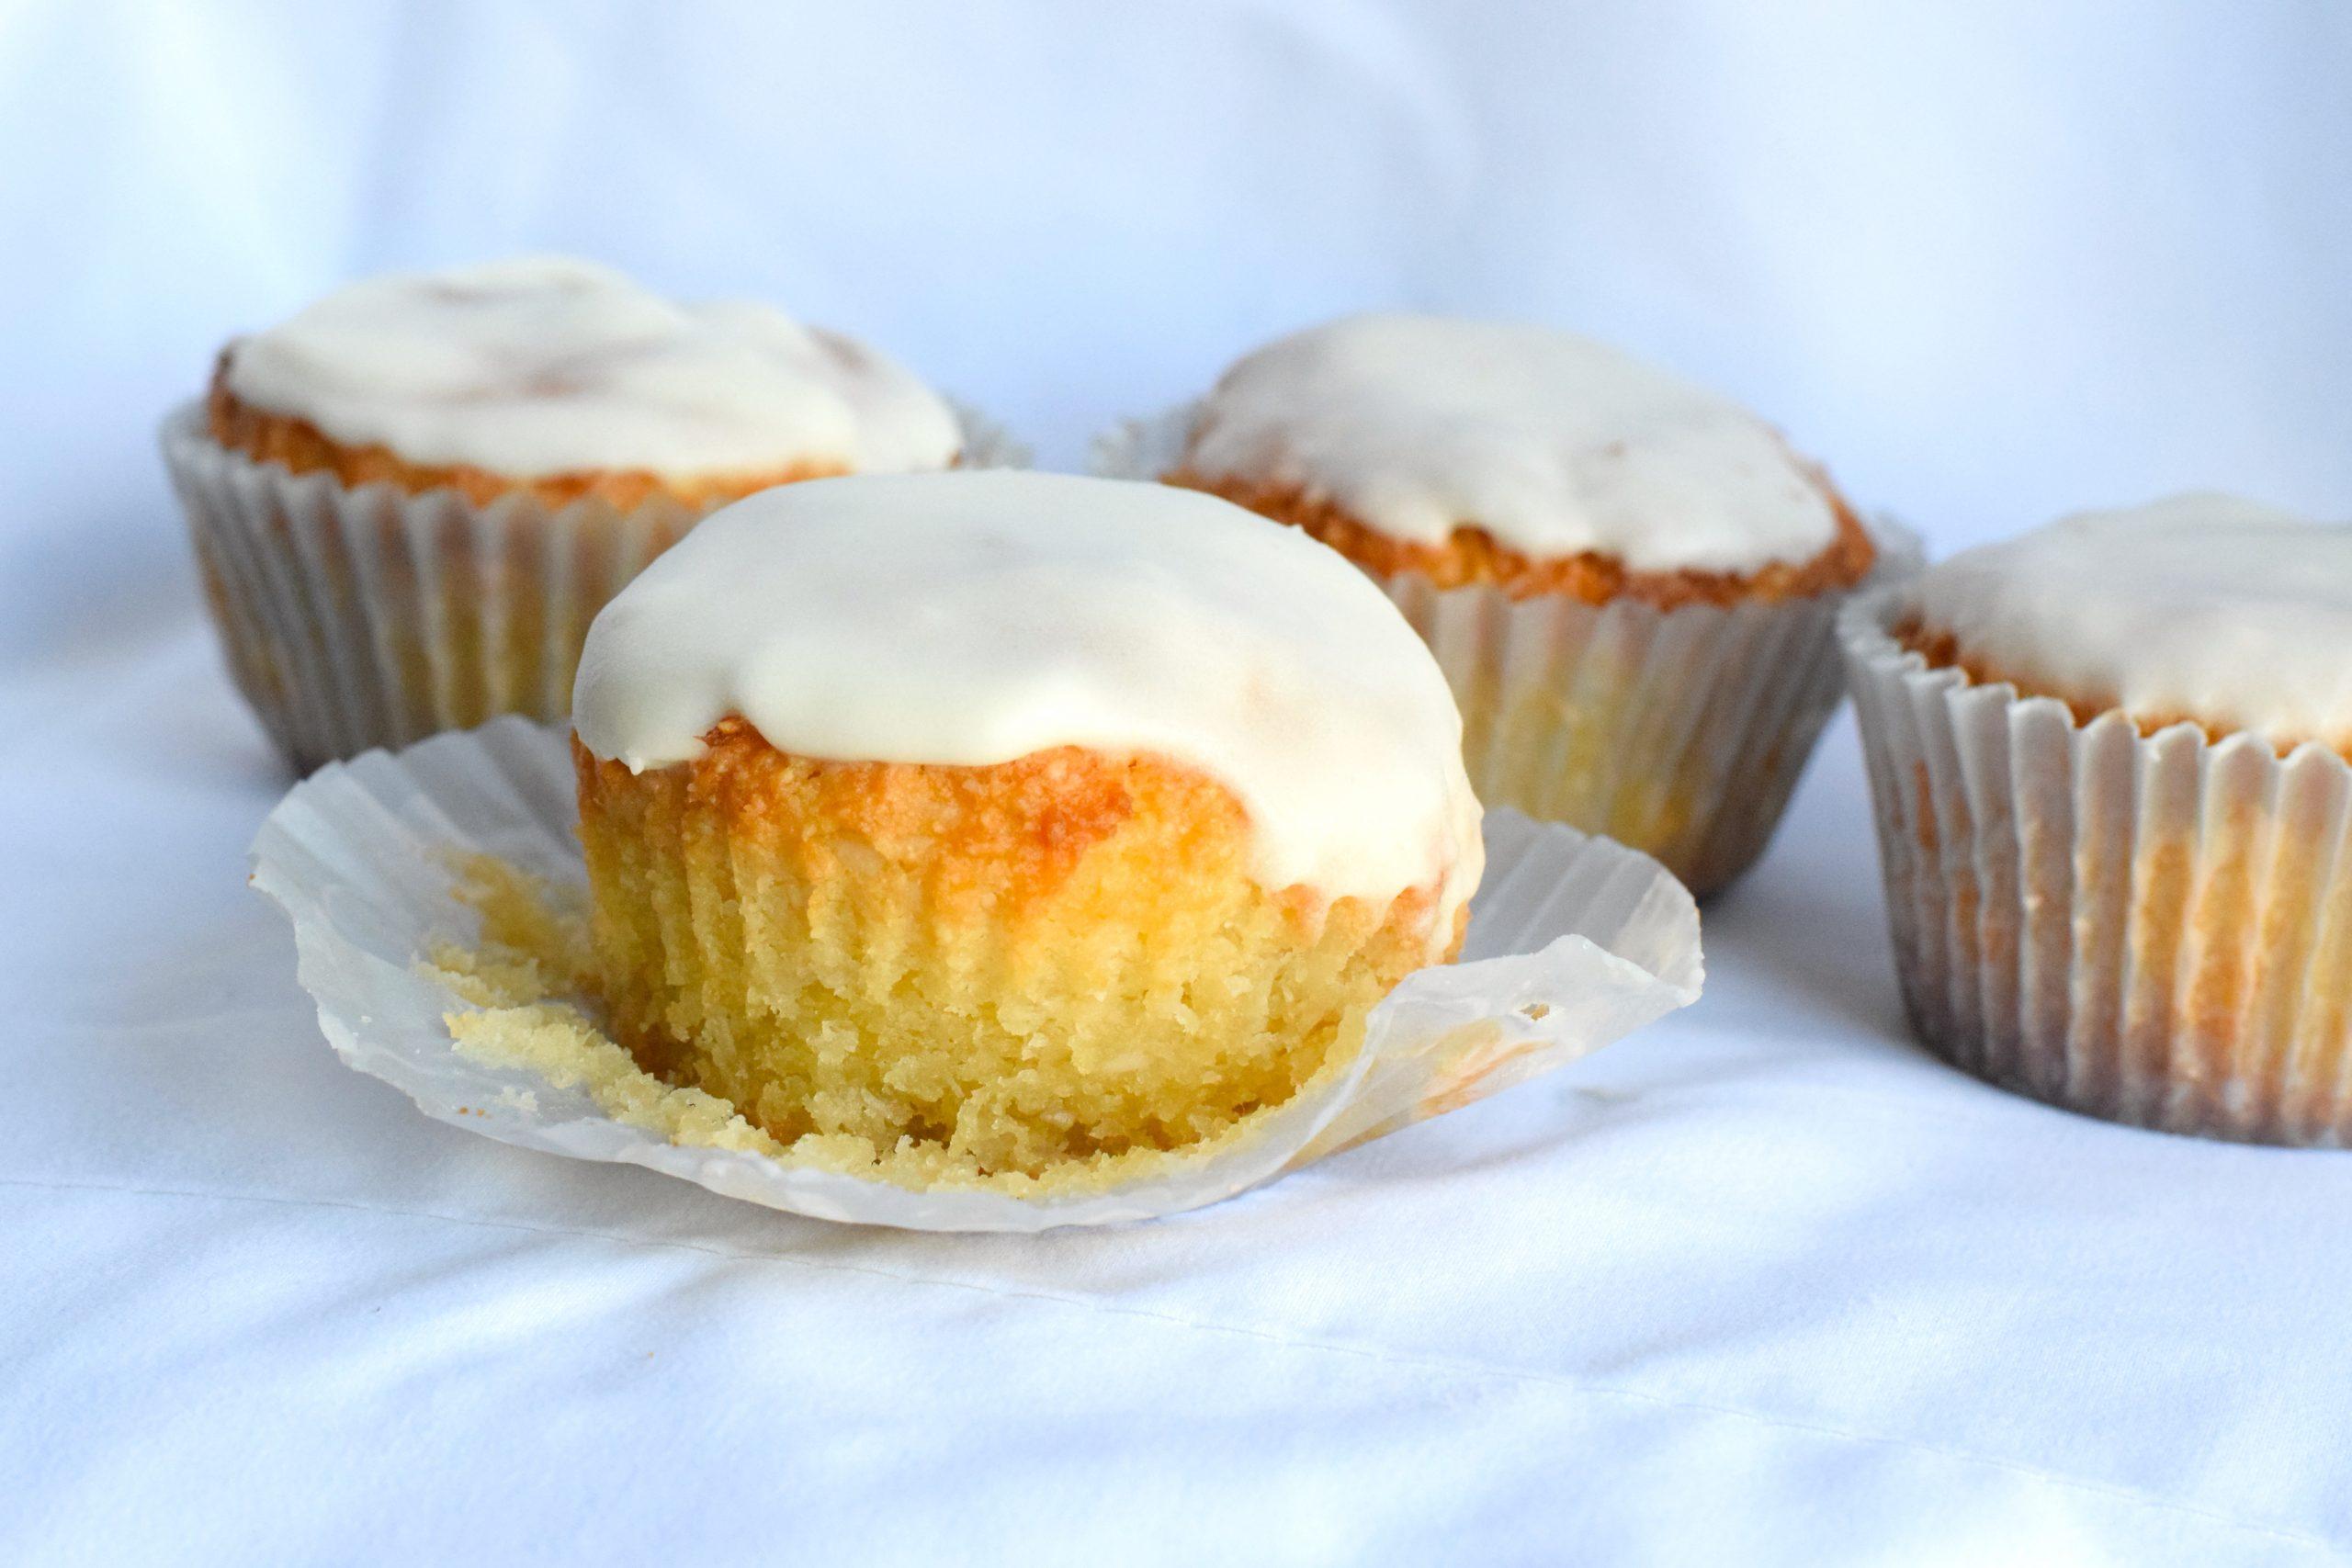 keto coconut muffins glazed